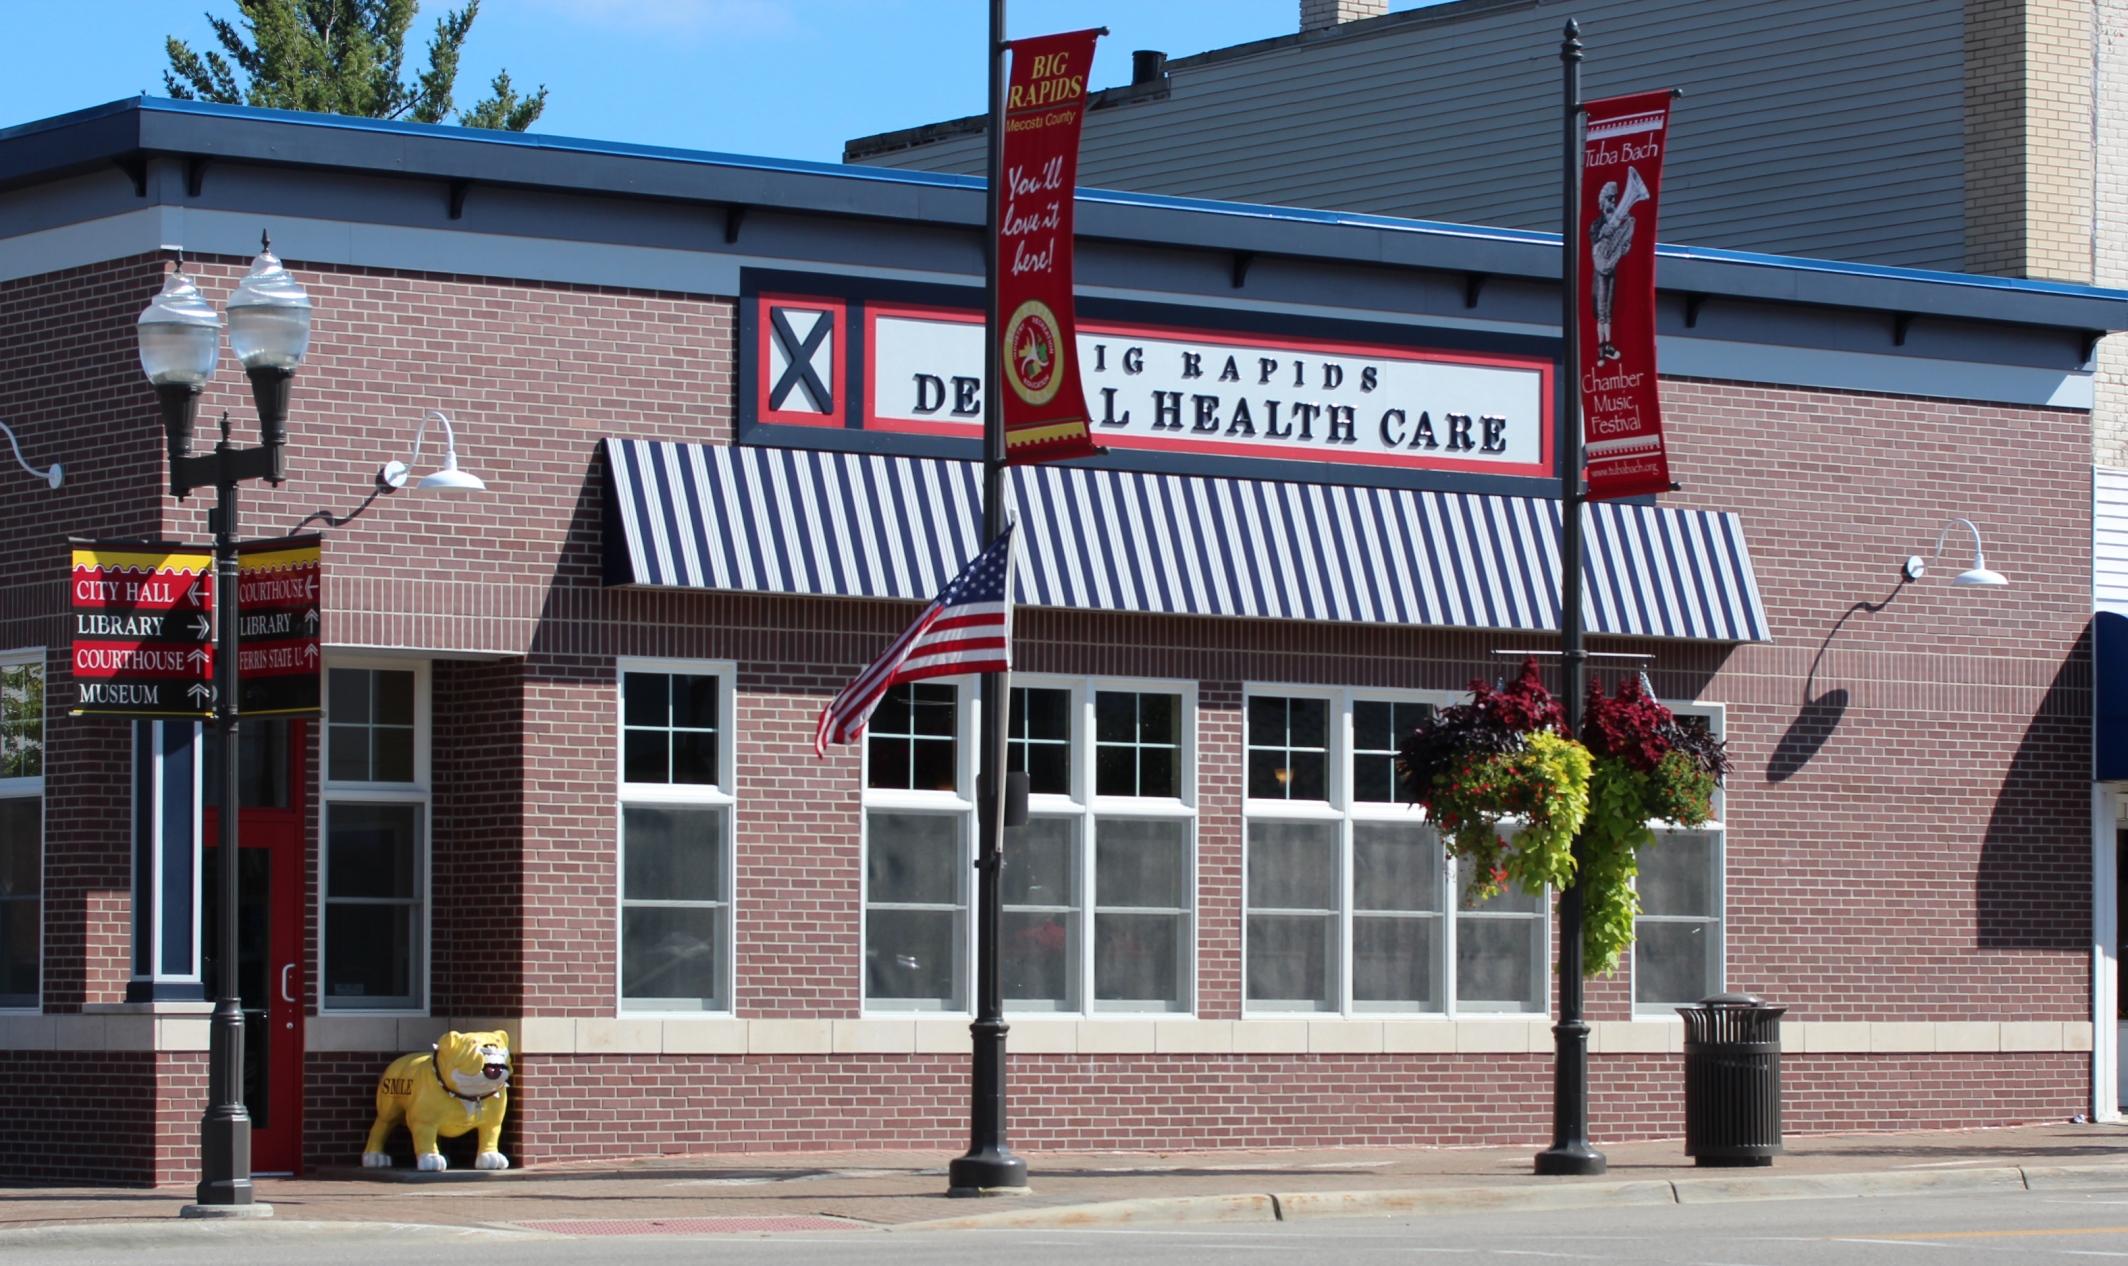 Big Rapids Dental Health Care 201 S Michigan Ave Big